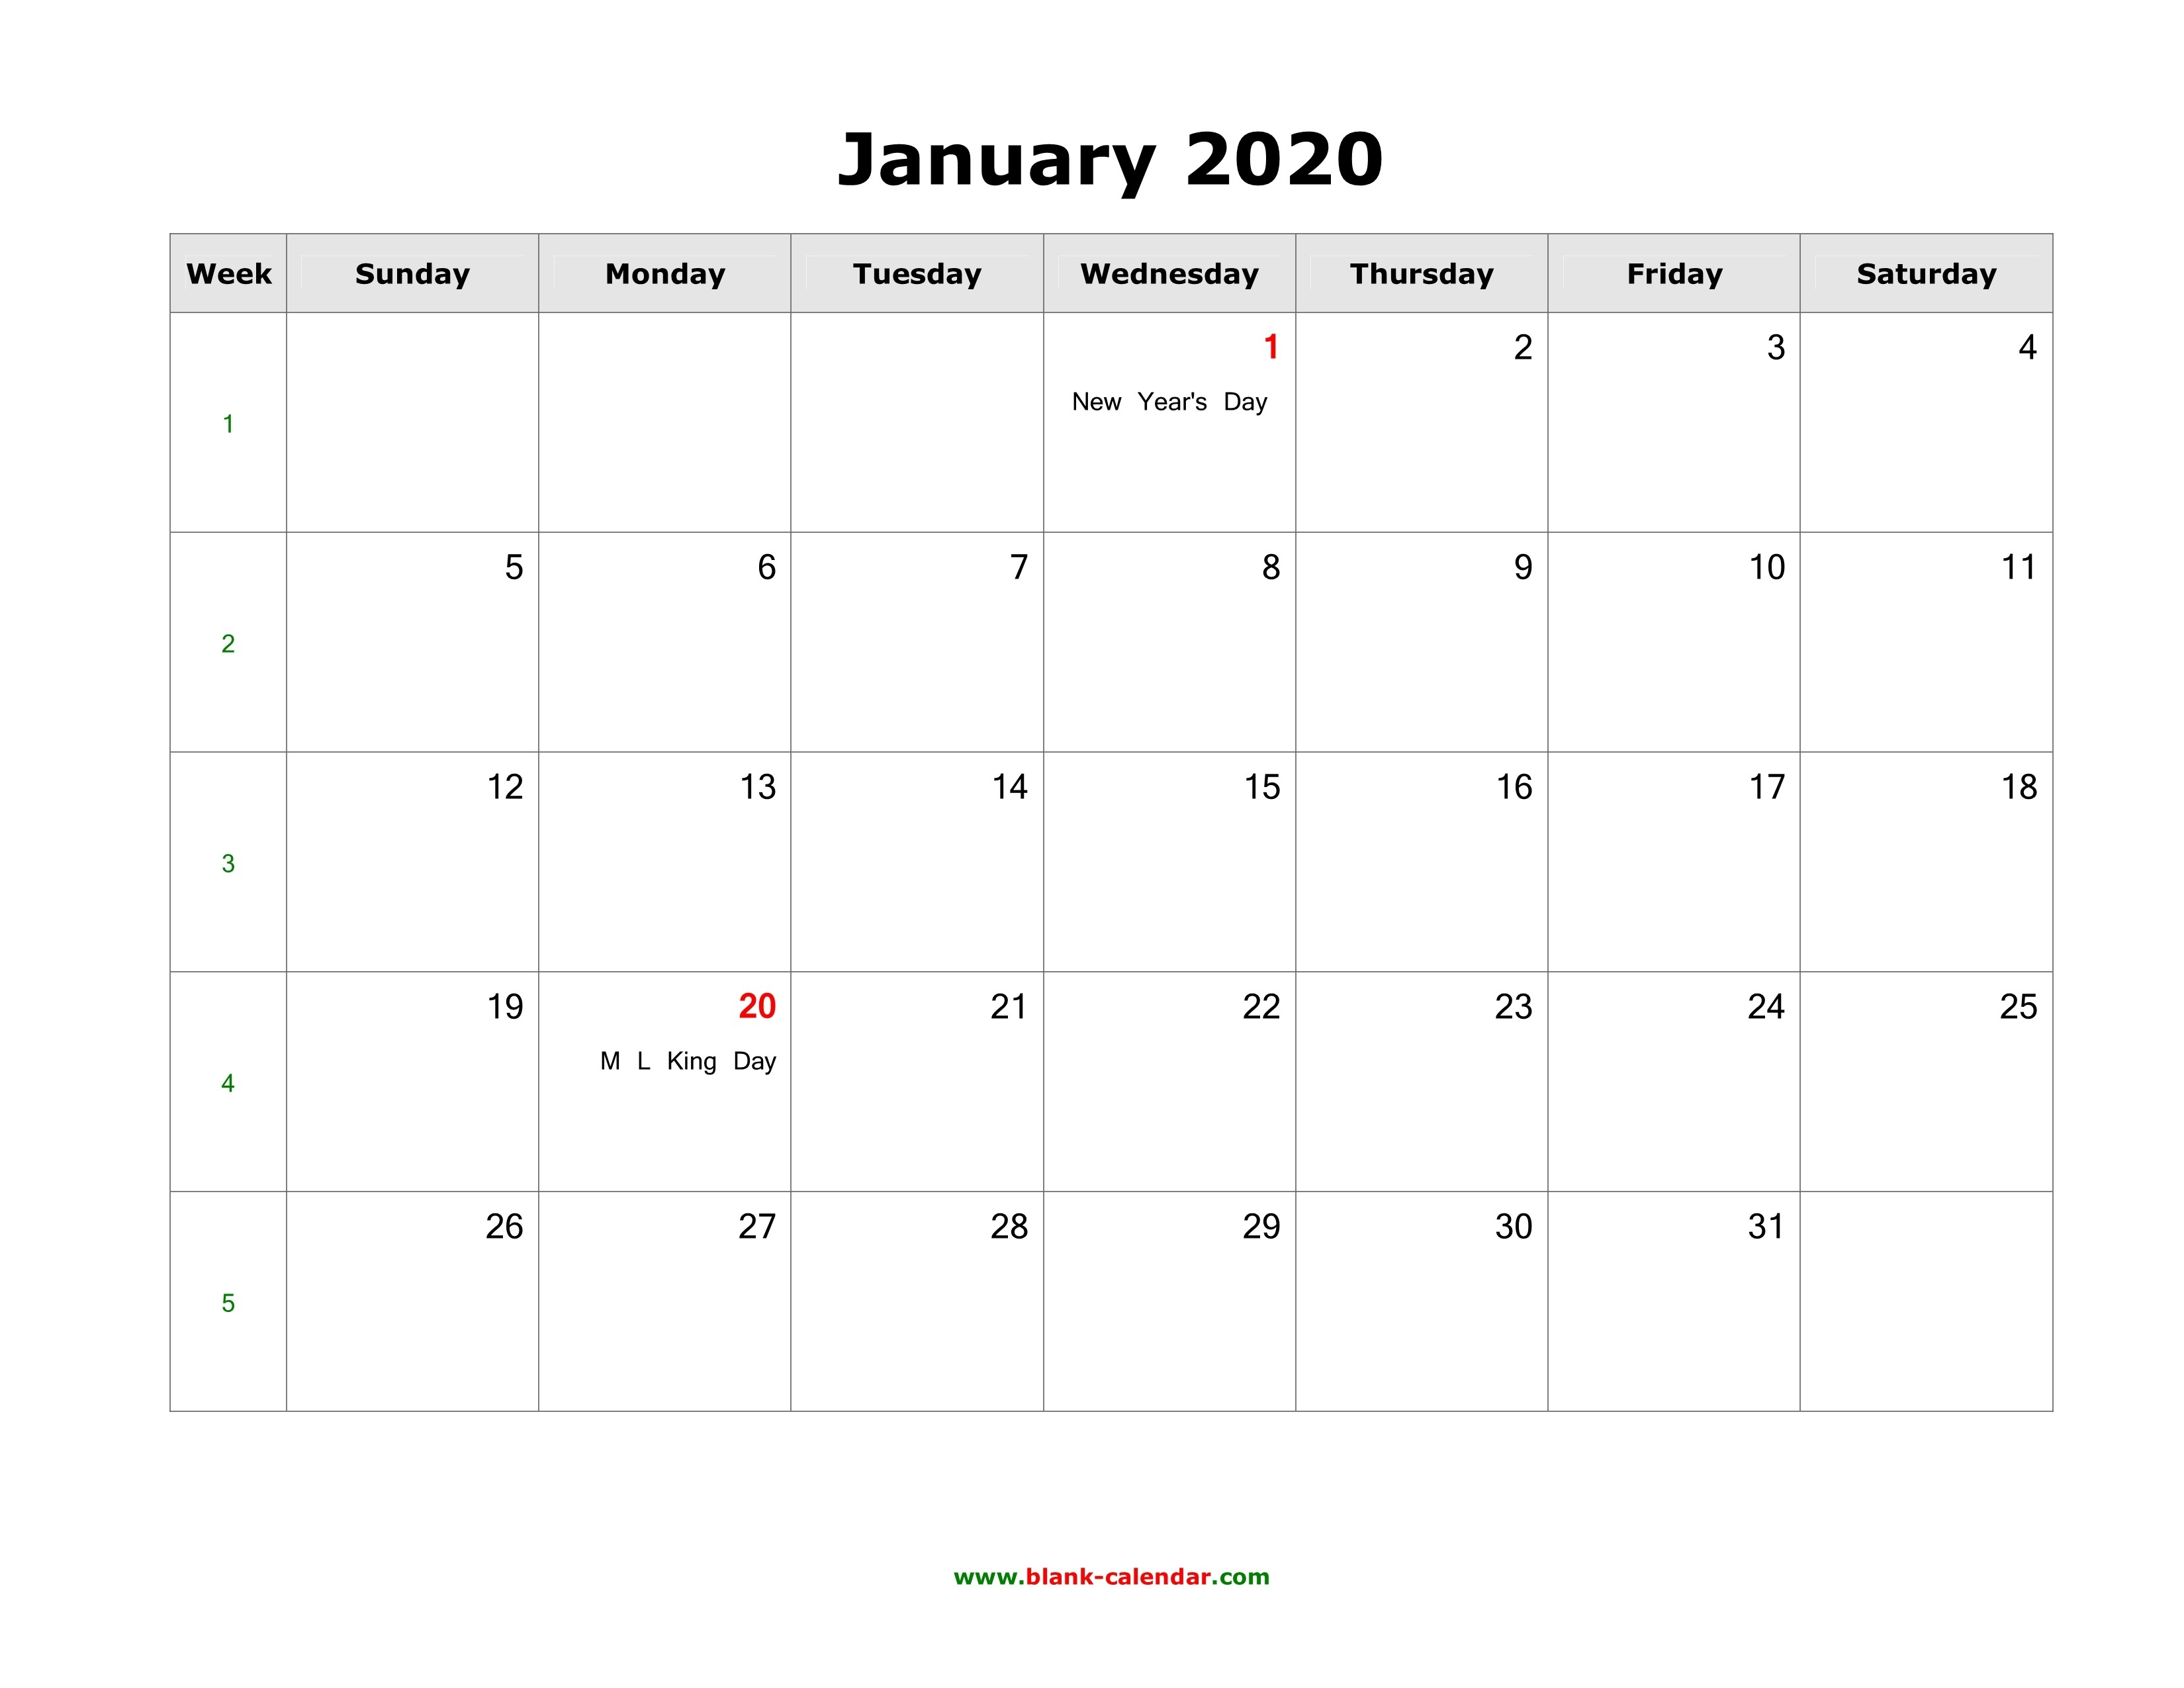 January 2020 Blank Calendar | Free Download Calendar Templates-January 2020 Fillable Calendar